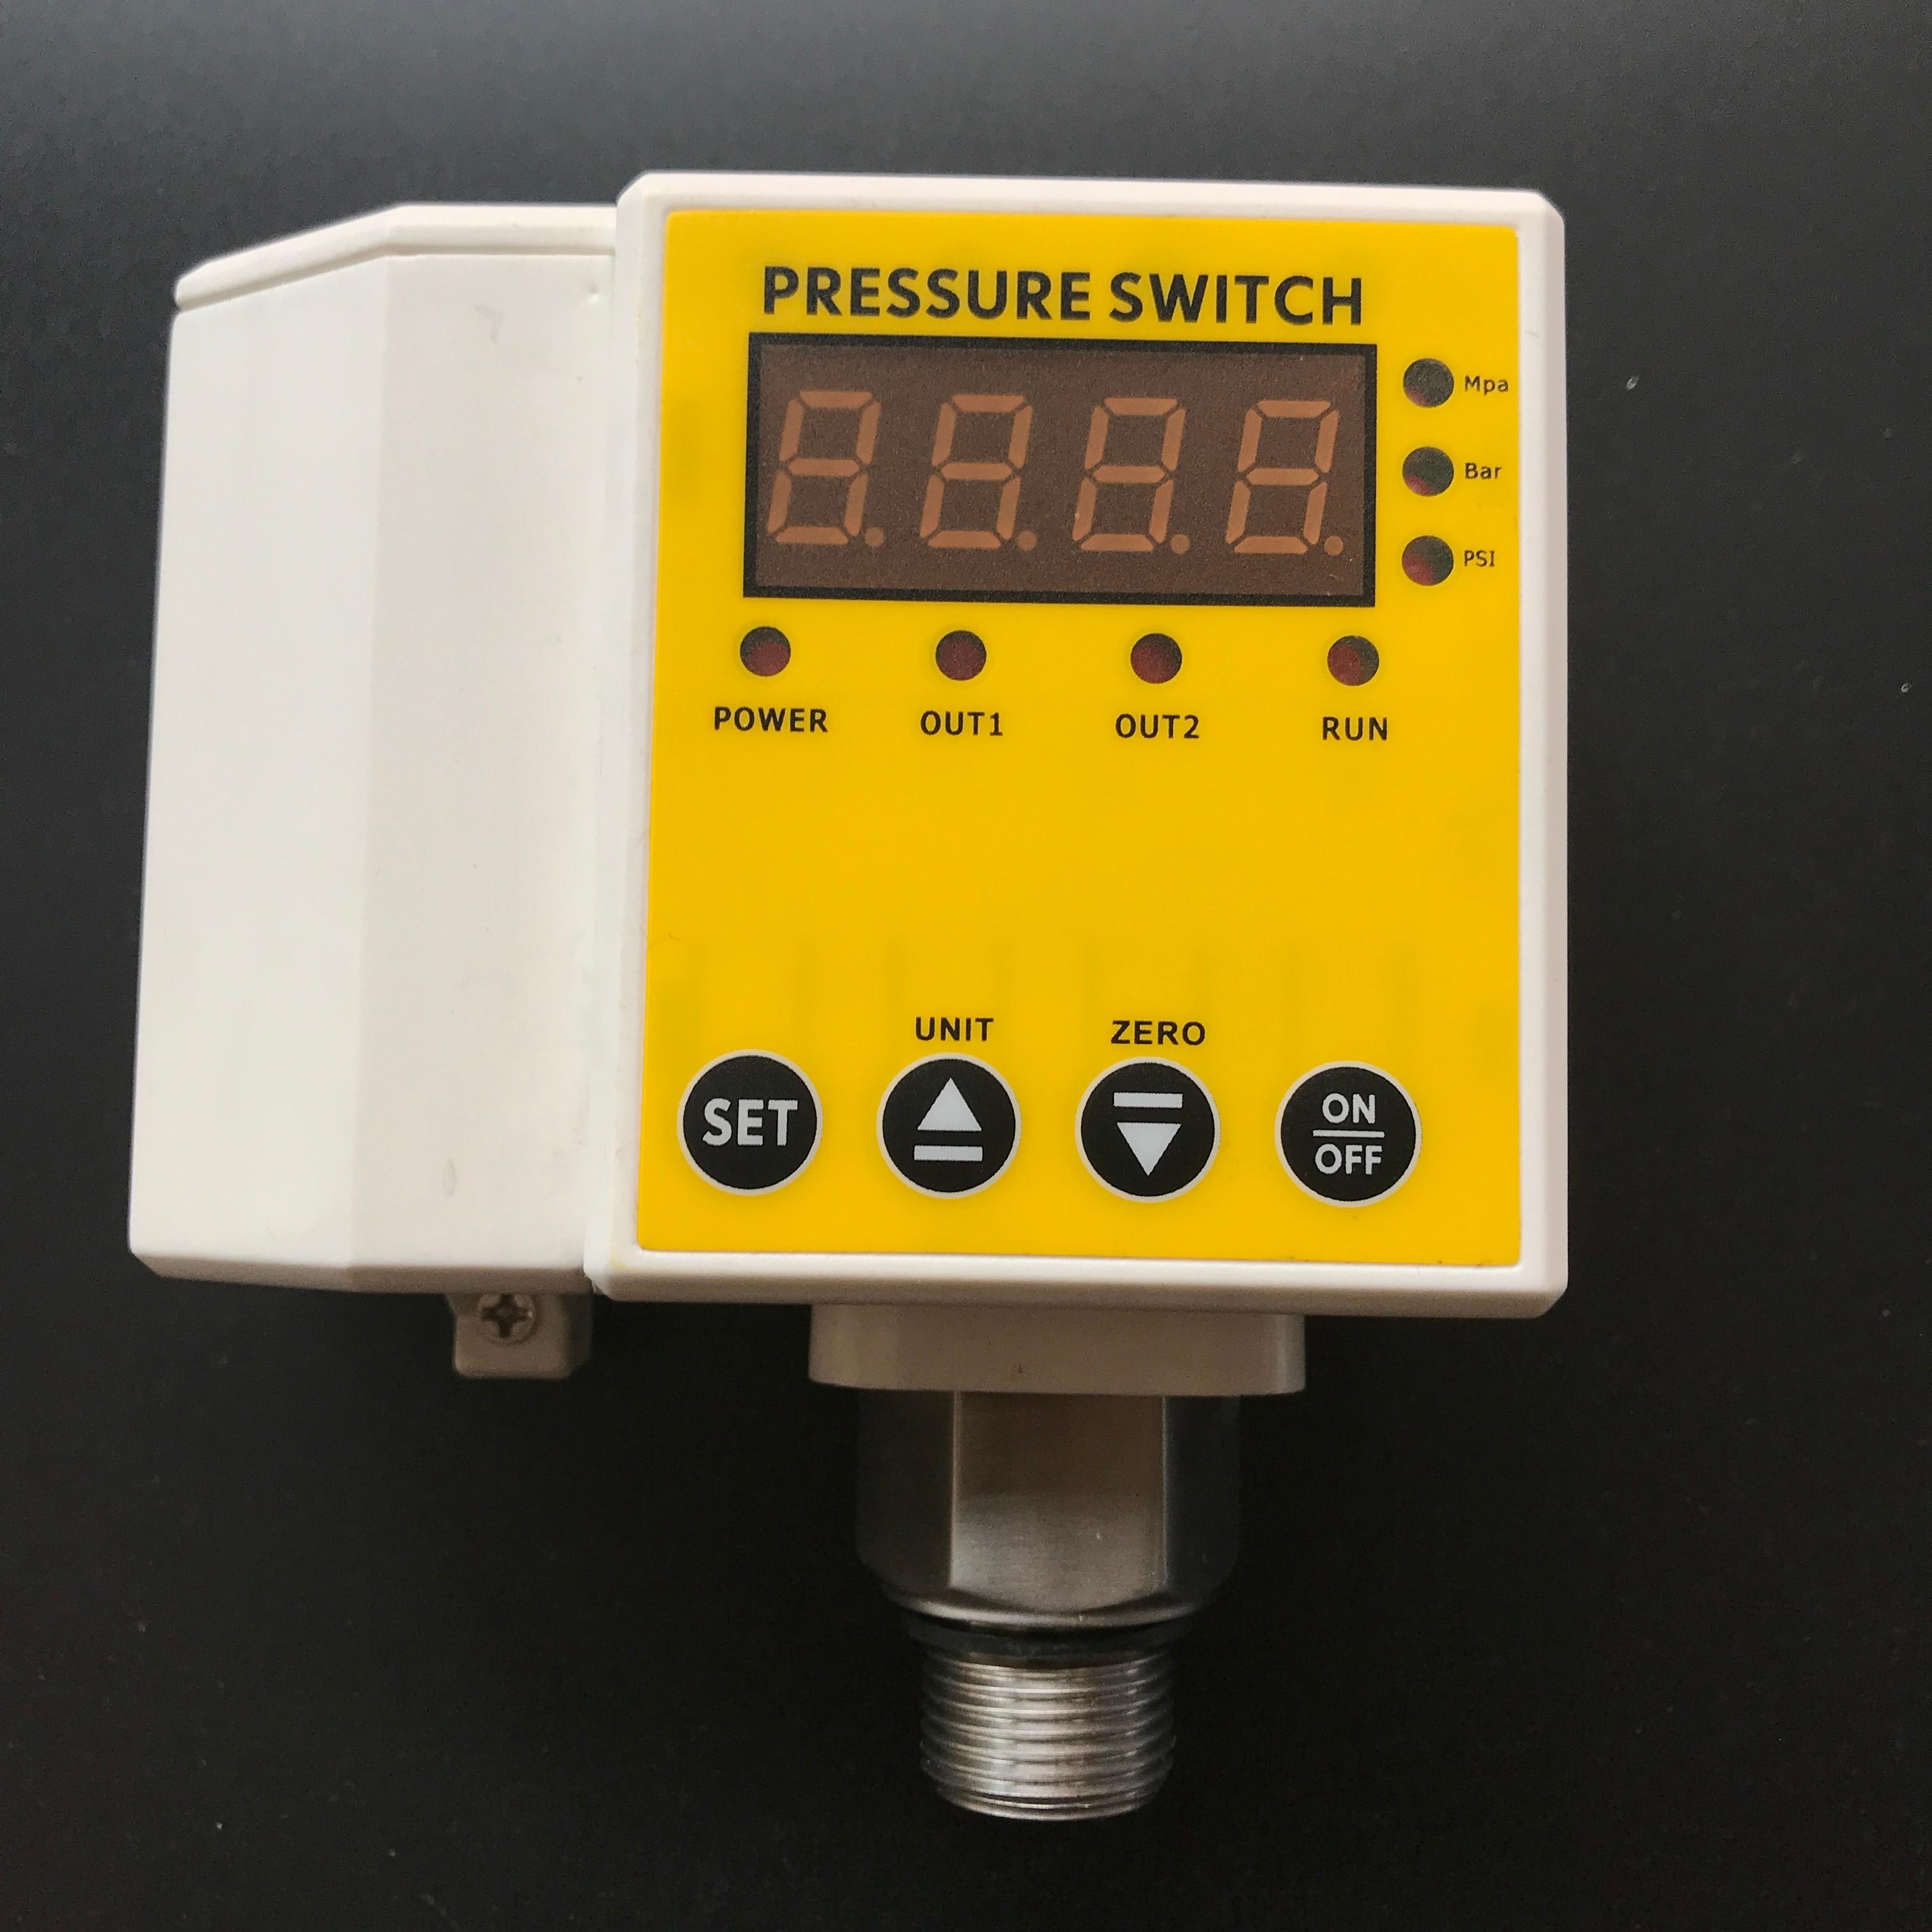 MD-S650 intelligent digital pressure switch electrical contact pressure gauge dual-group hydraulic switch Accuracy of 0.5% md s910 digital pressure controller digital pressure gauge digital pressure switch range 0 1 6mpa m20x1 5 ac220v